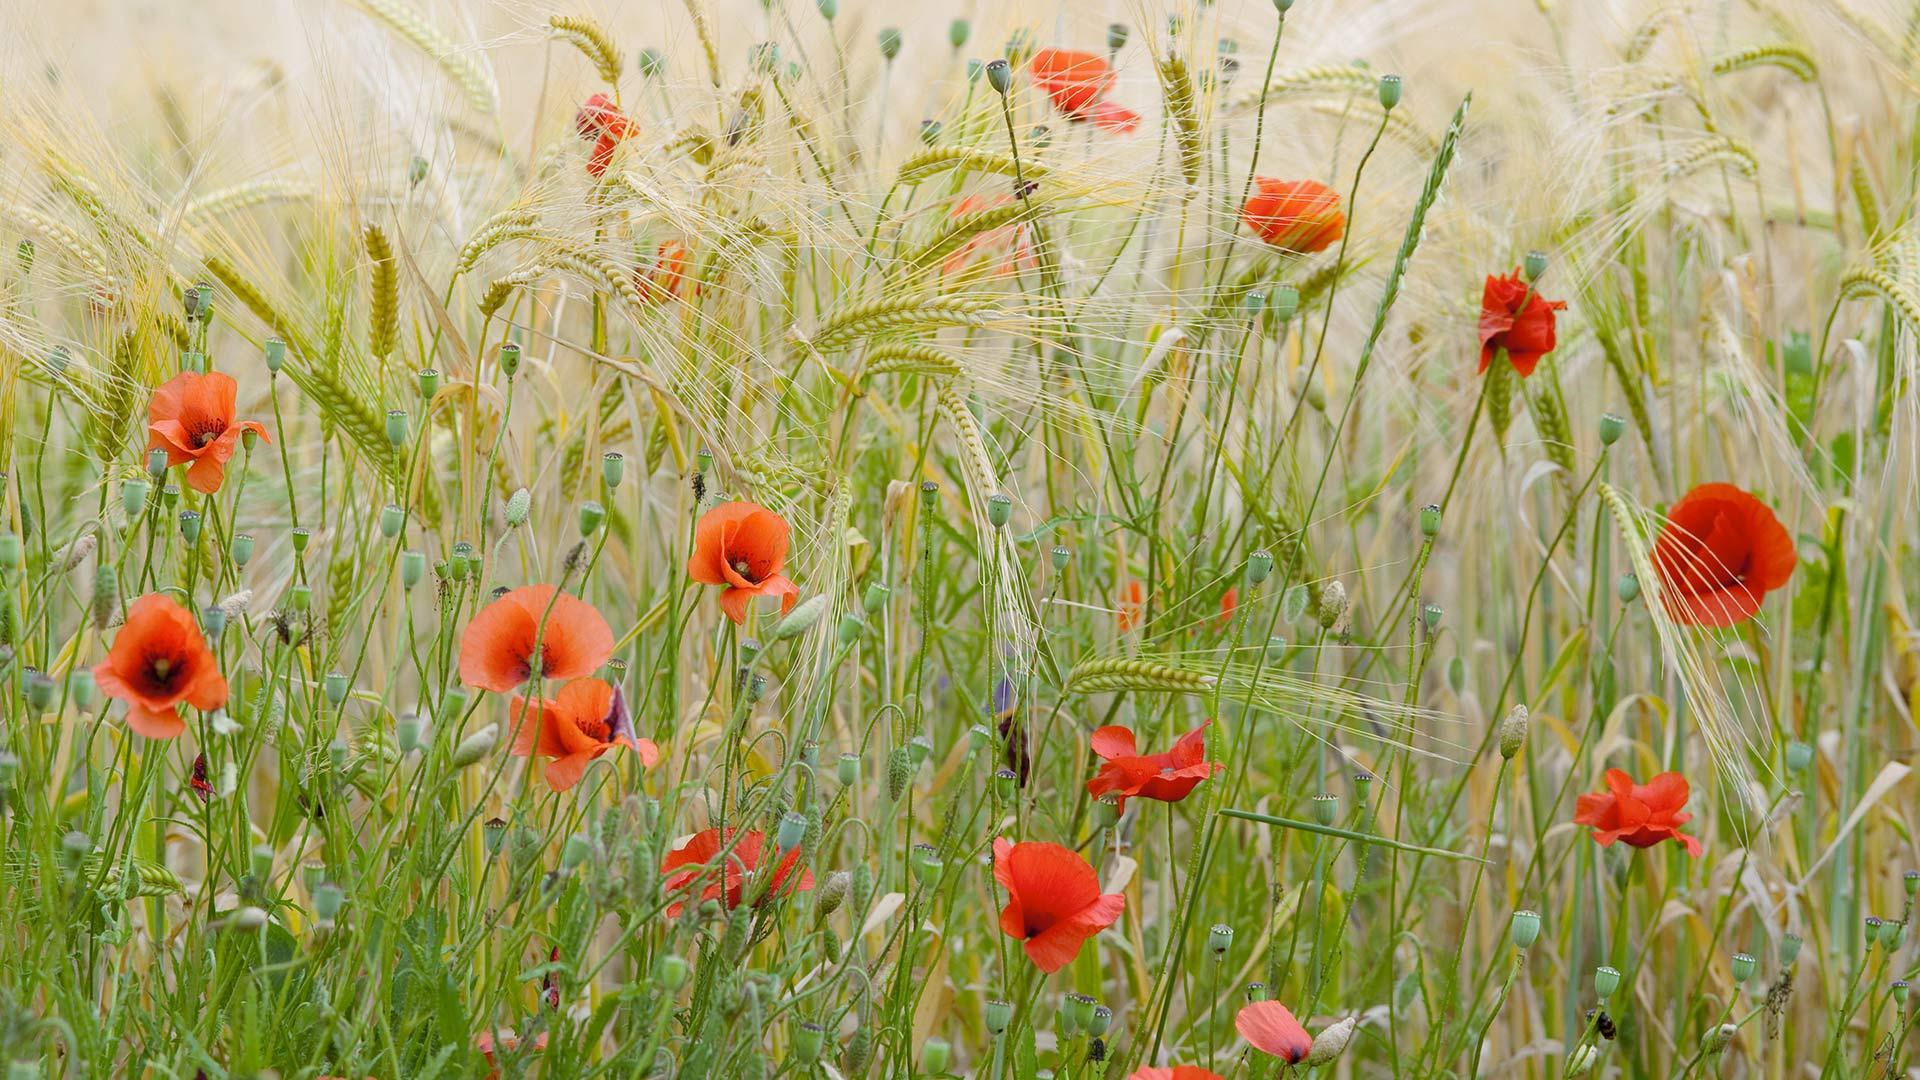 Provence Poppiesfield Bing Wallpaper Download 1920x1080